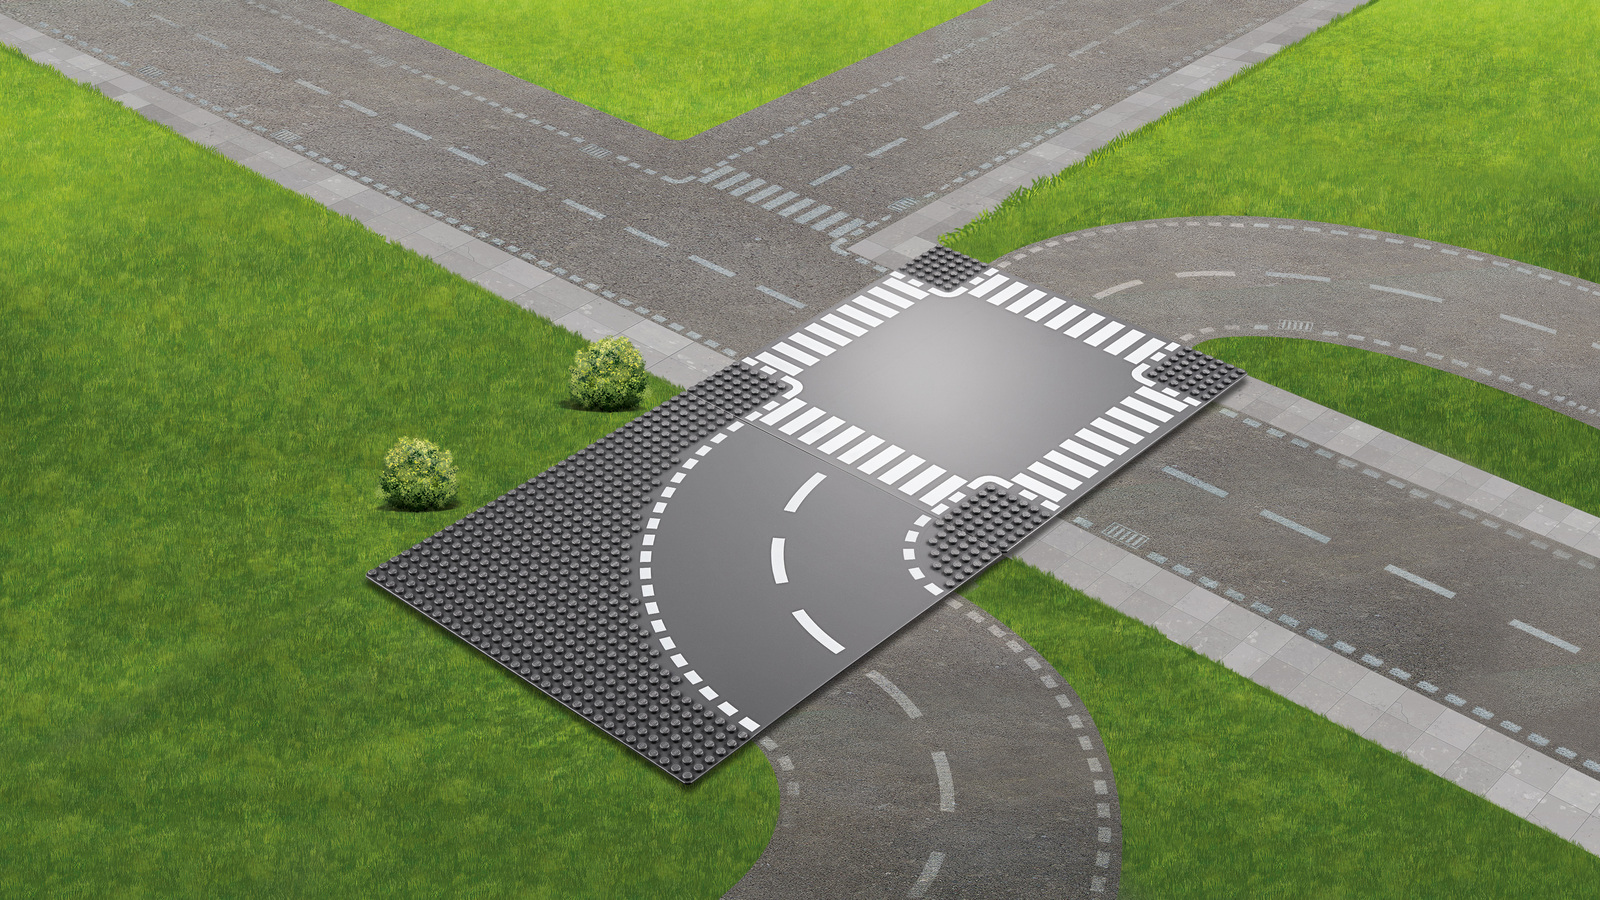 LEGO City - Curve & Crossroad (60237) image